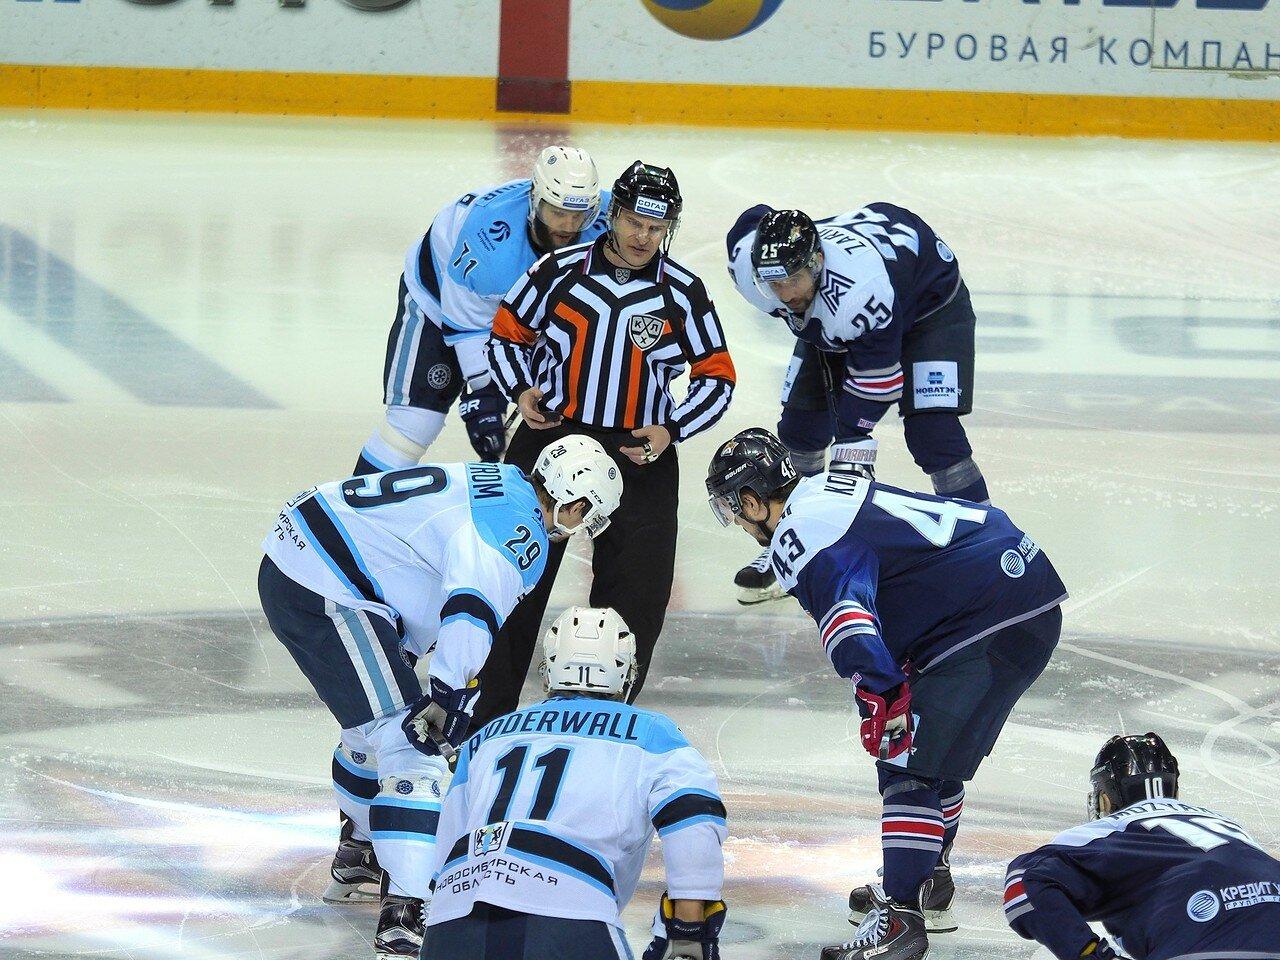 52Восток 1/2 плей-офф Металлург - Сибирь 08.03.2016